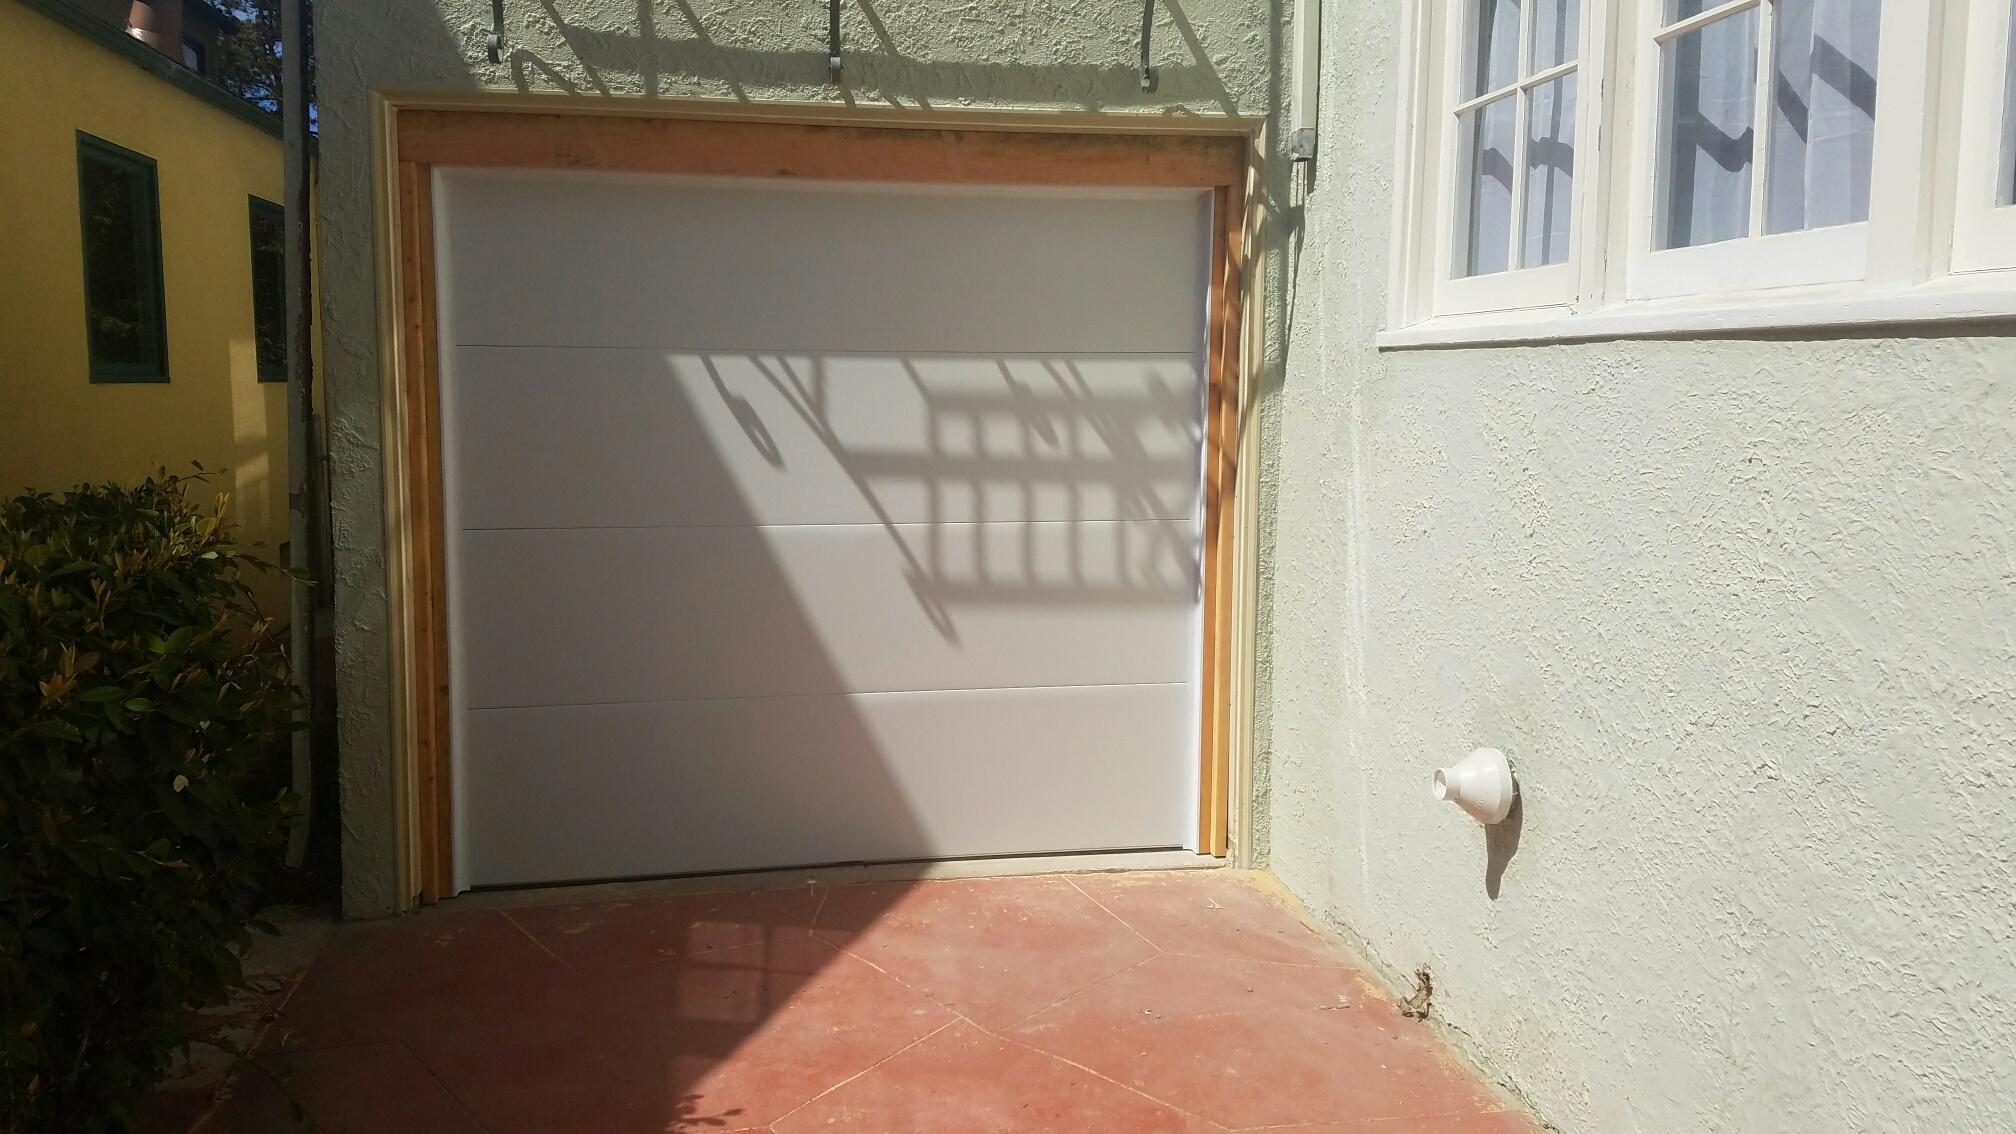 All Bay Garage Doors - Flush Panel Garage Doors - Kevin Chervatin - 53.JPG